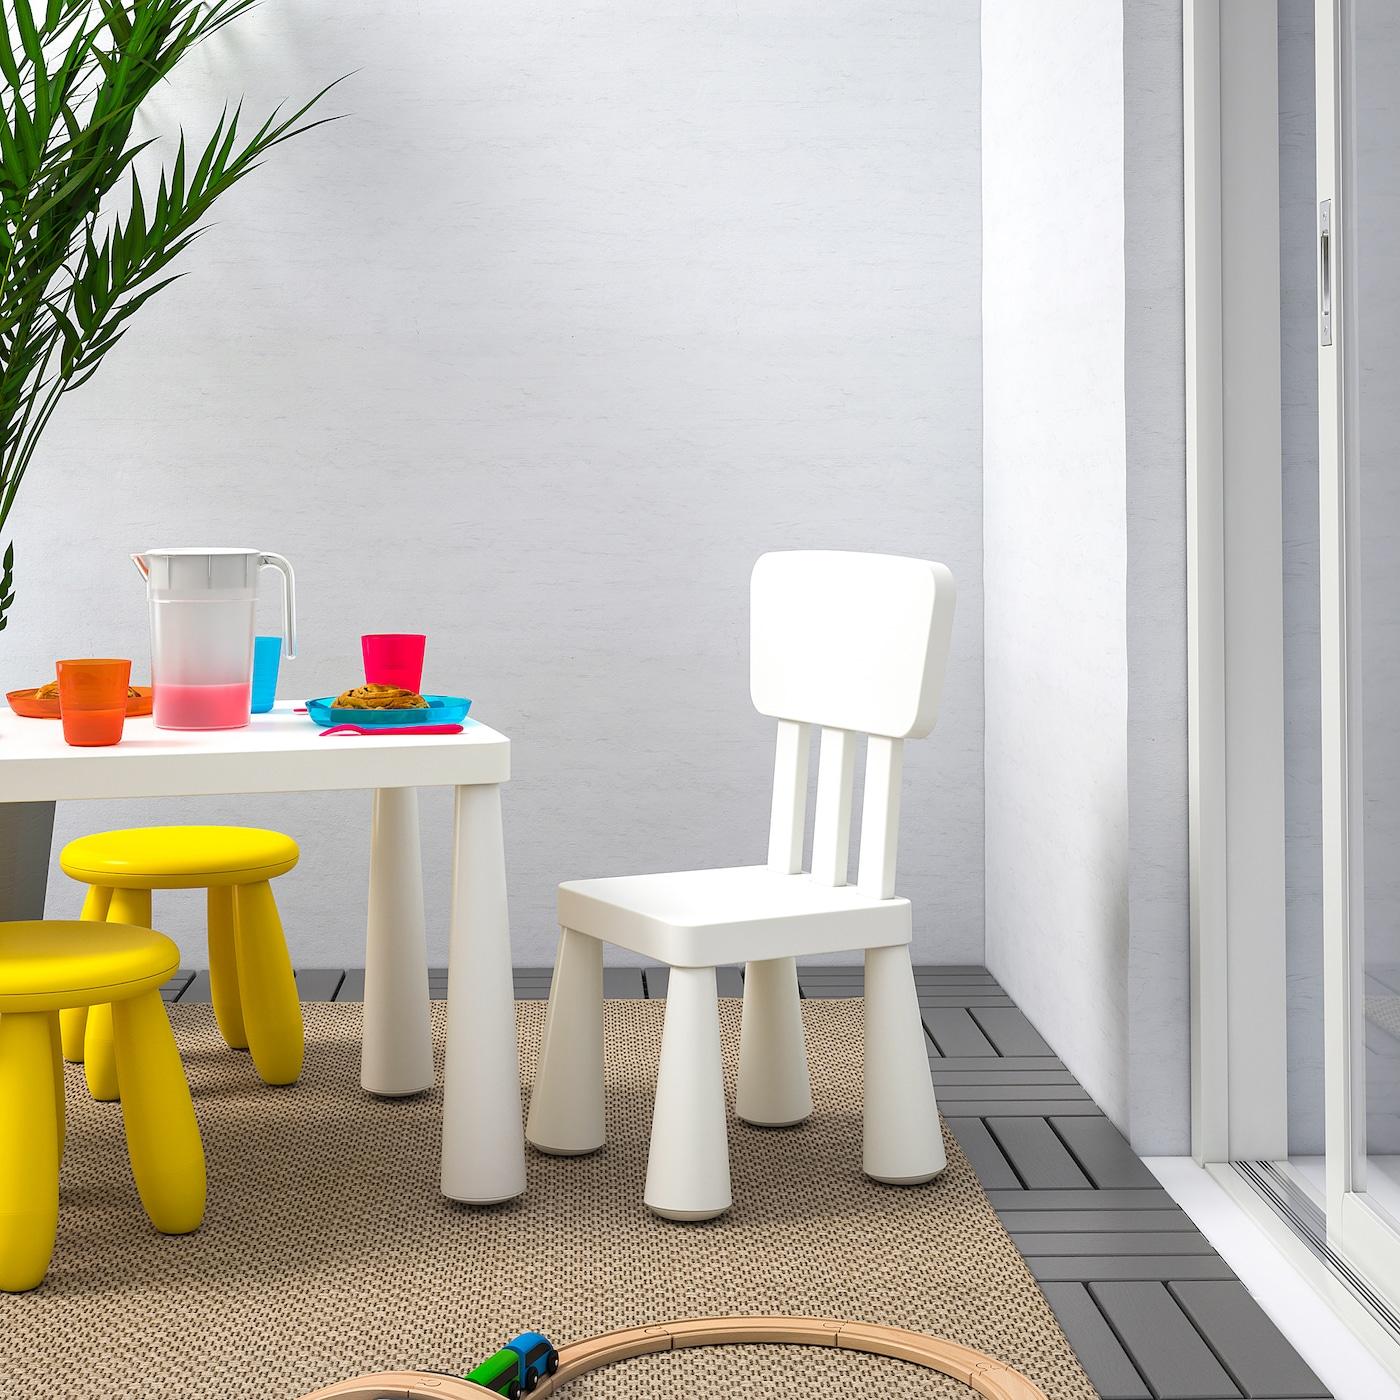 MAMMUT dečja stolica unutra/spolja/bela 39 cm 36 cm 67 cm 26 cm 30 cm